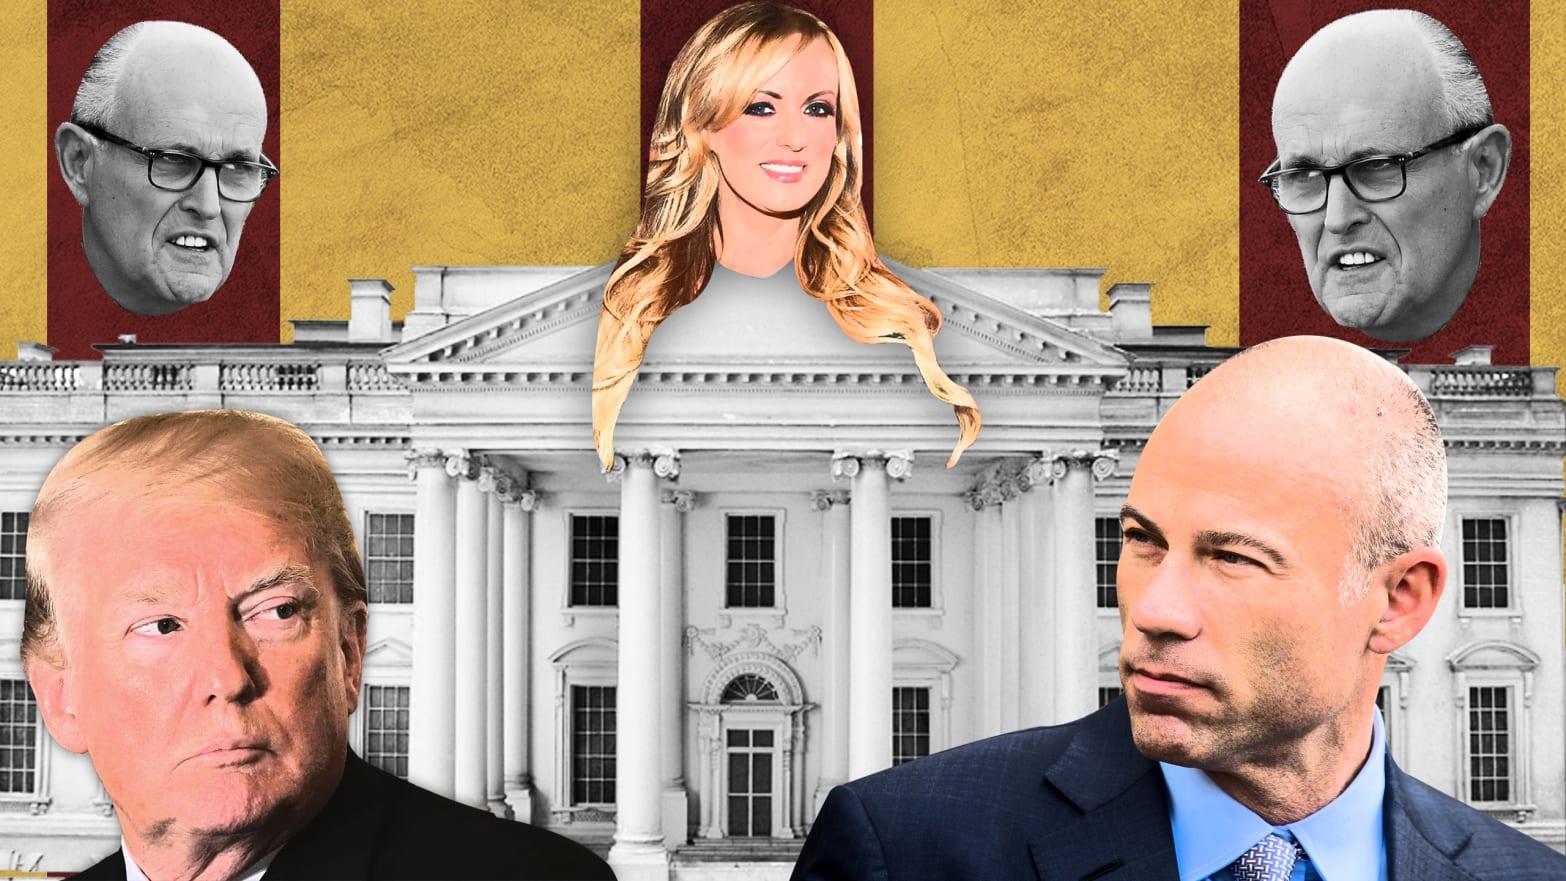 Trump Has No Plan to Counterpunch Michael Avenatti